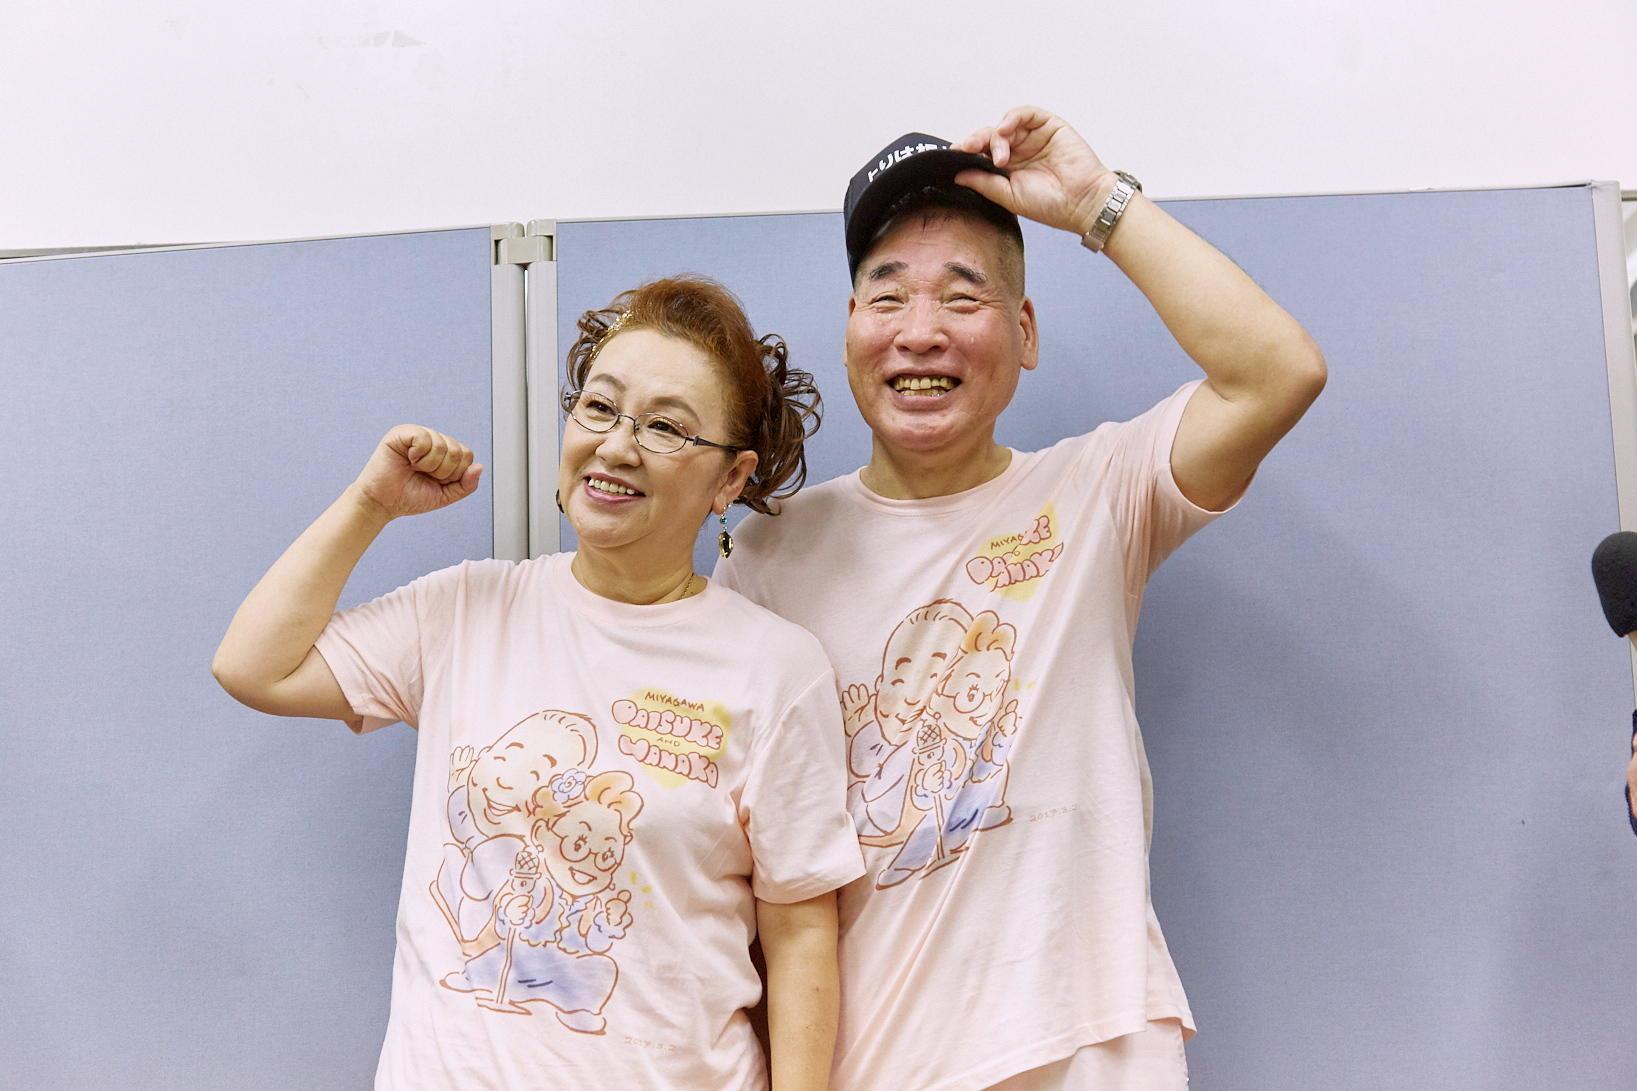 http://news.yoshimoto.co.jp/20170530180547-7f6ad858389d39cd7922a17fa674136b34b693f6.jpg